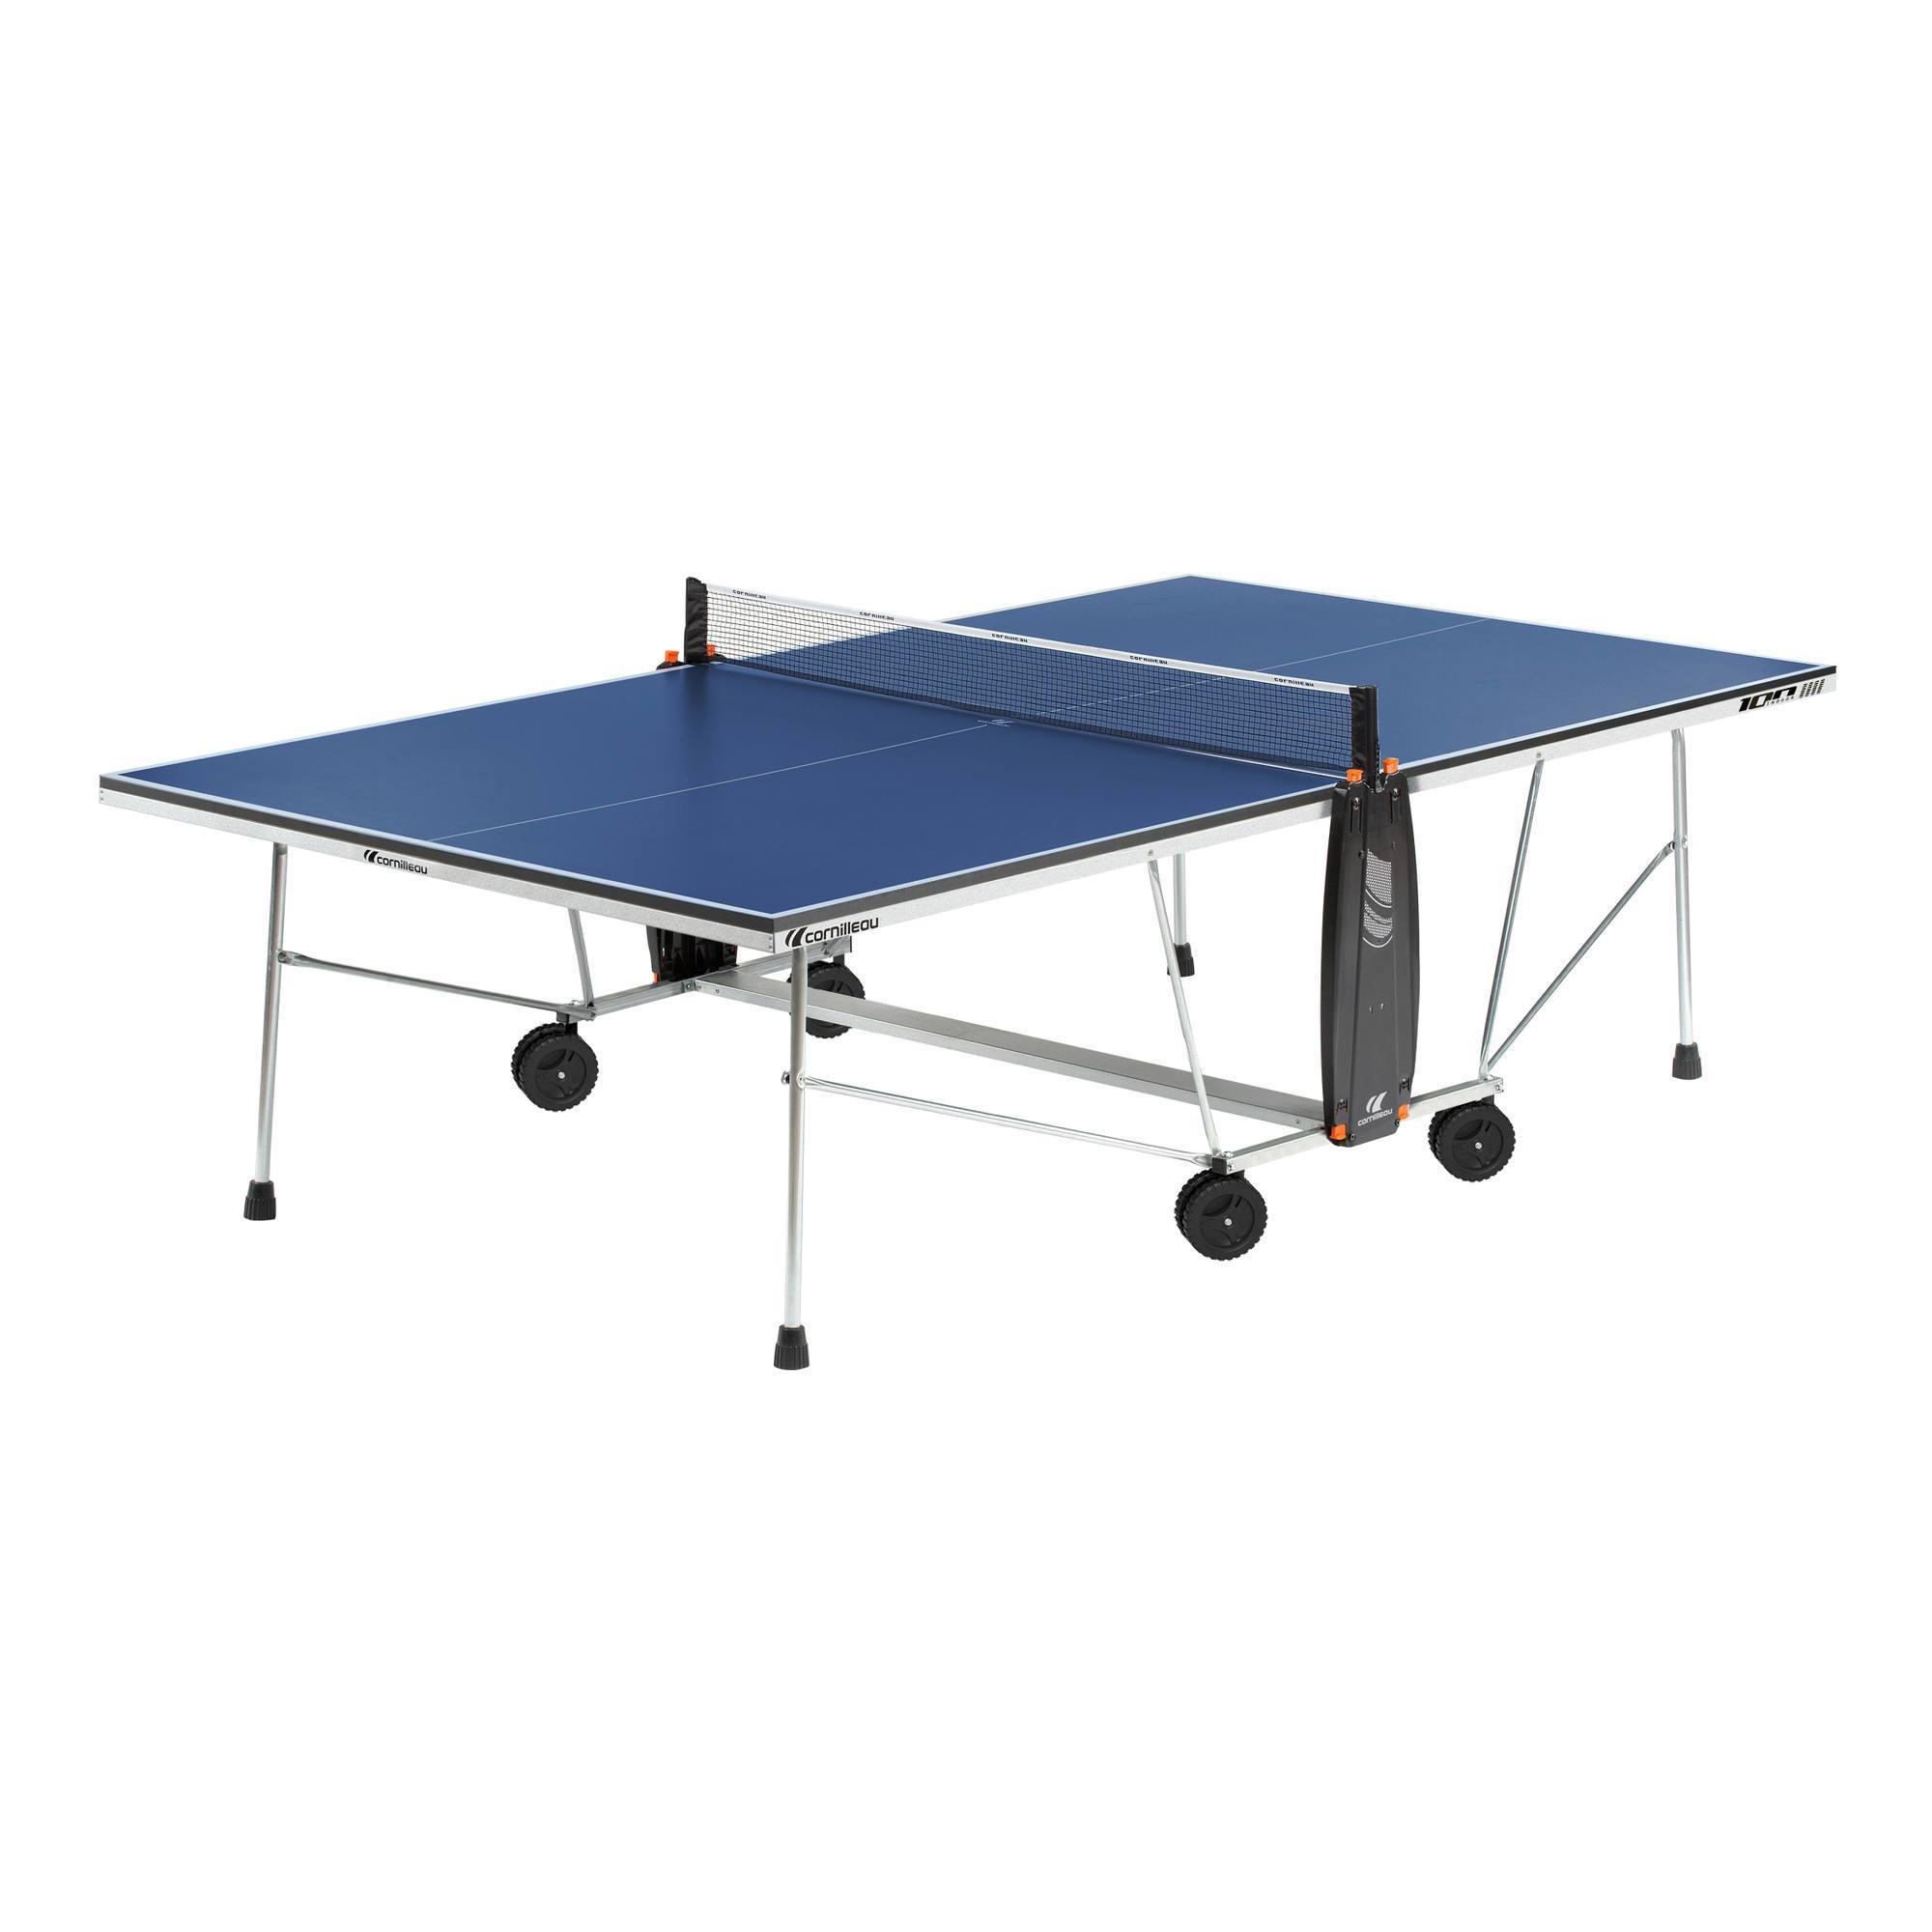 TABLE DE TENNIS DE TABLE FREE 100 INDOOR